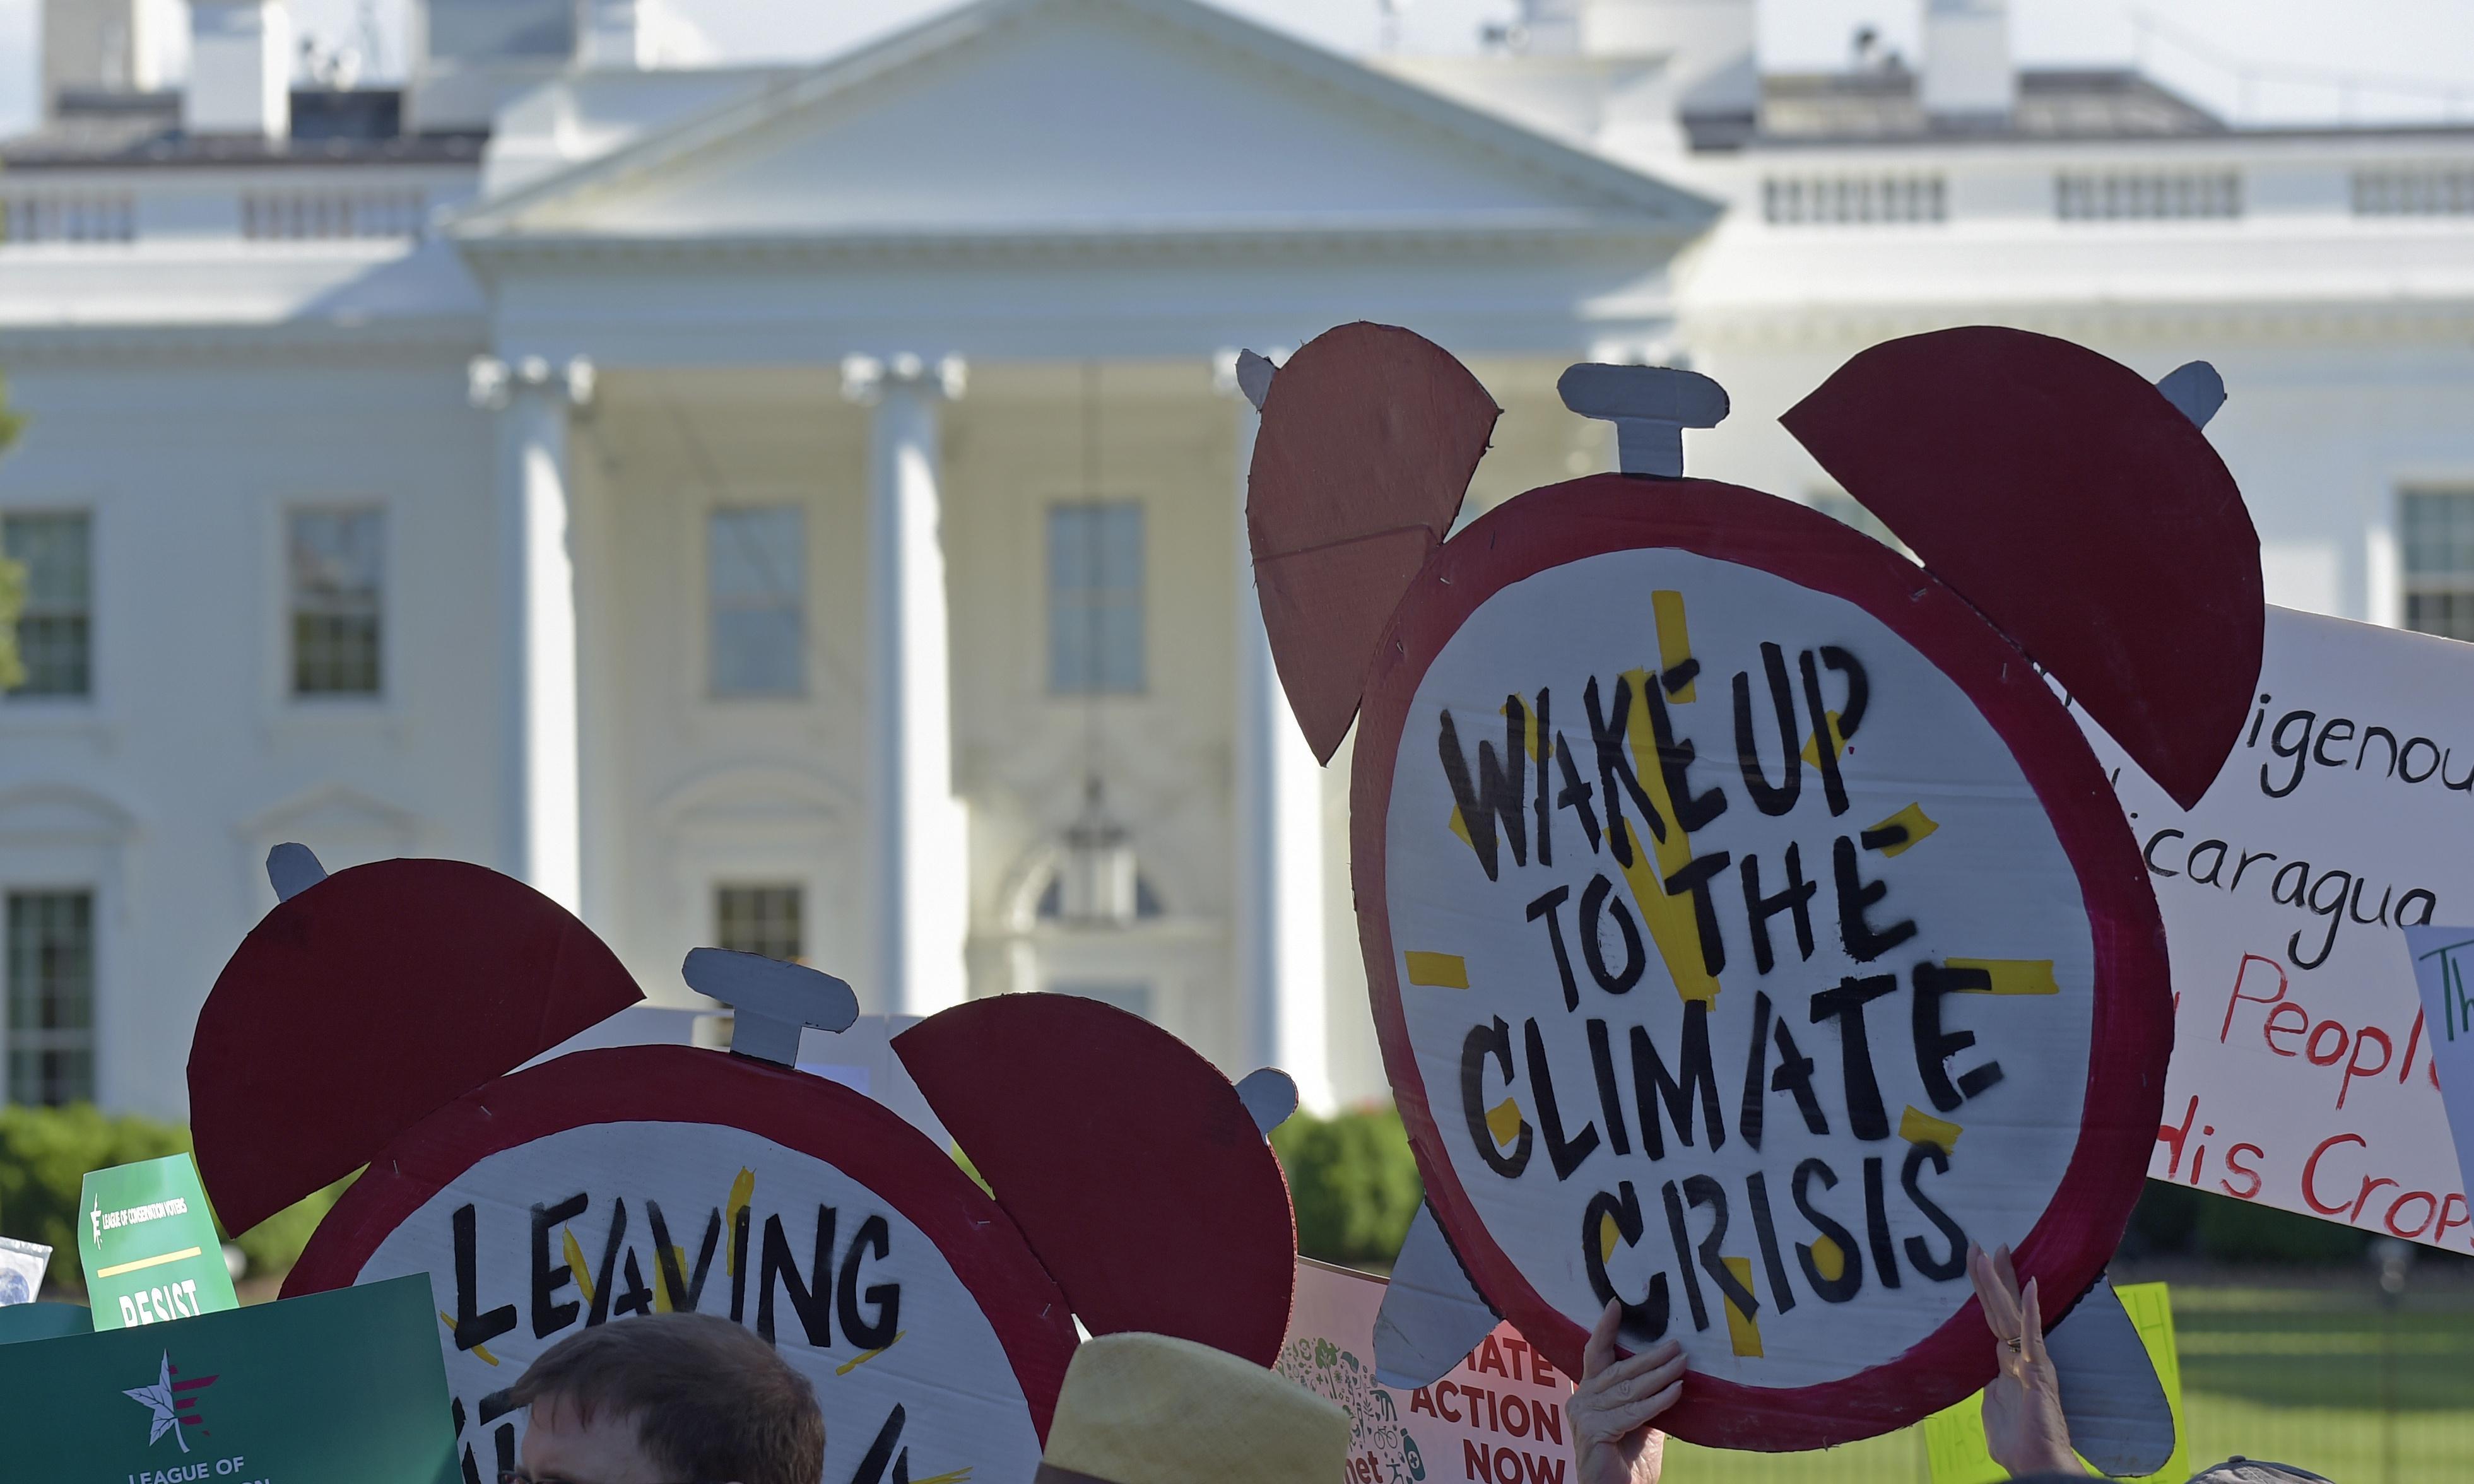 'Team Oil': ex-oil worker seeks to educate legislators on climate change